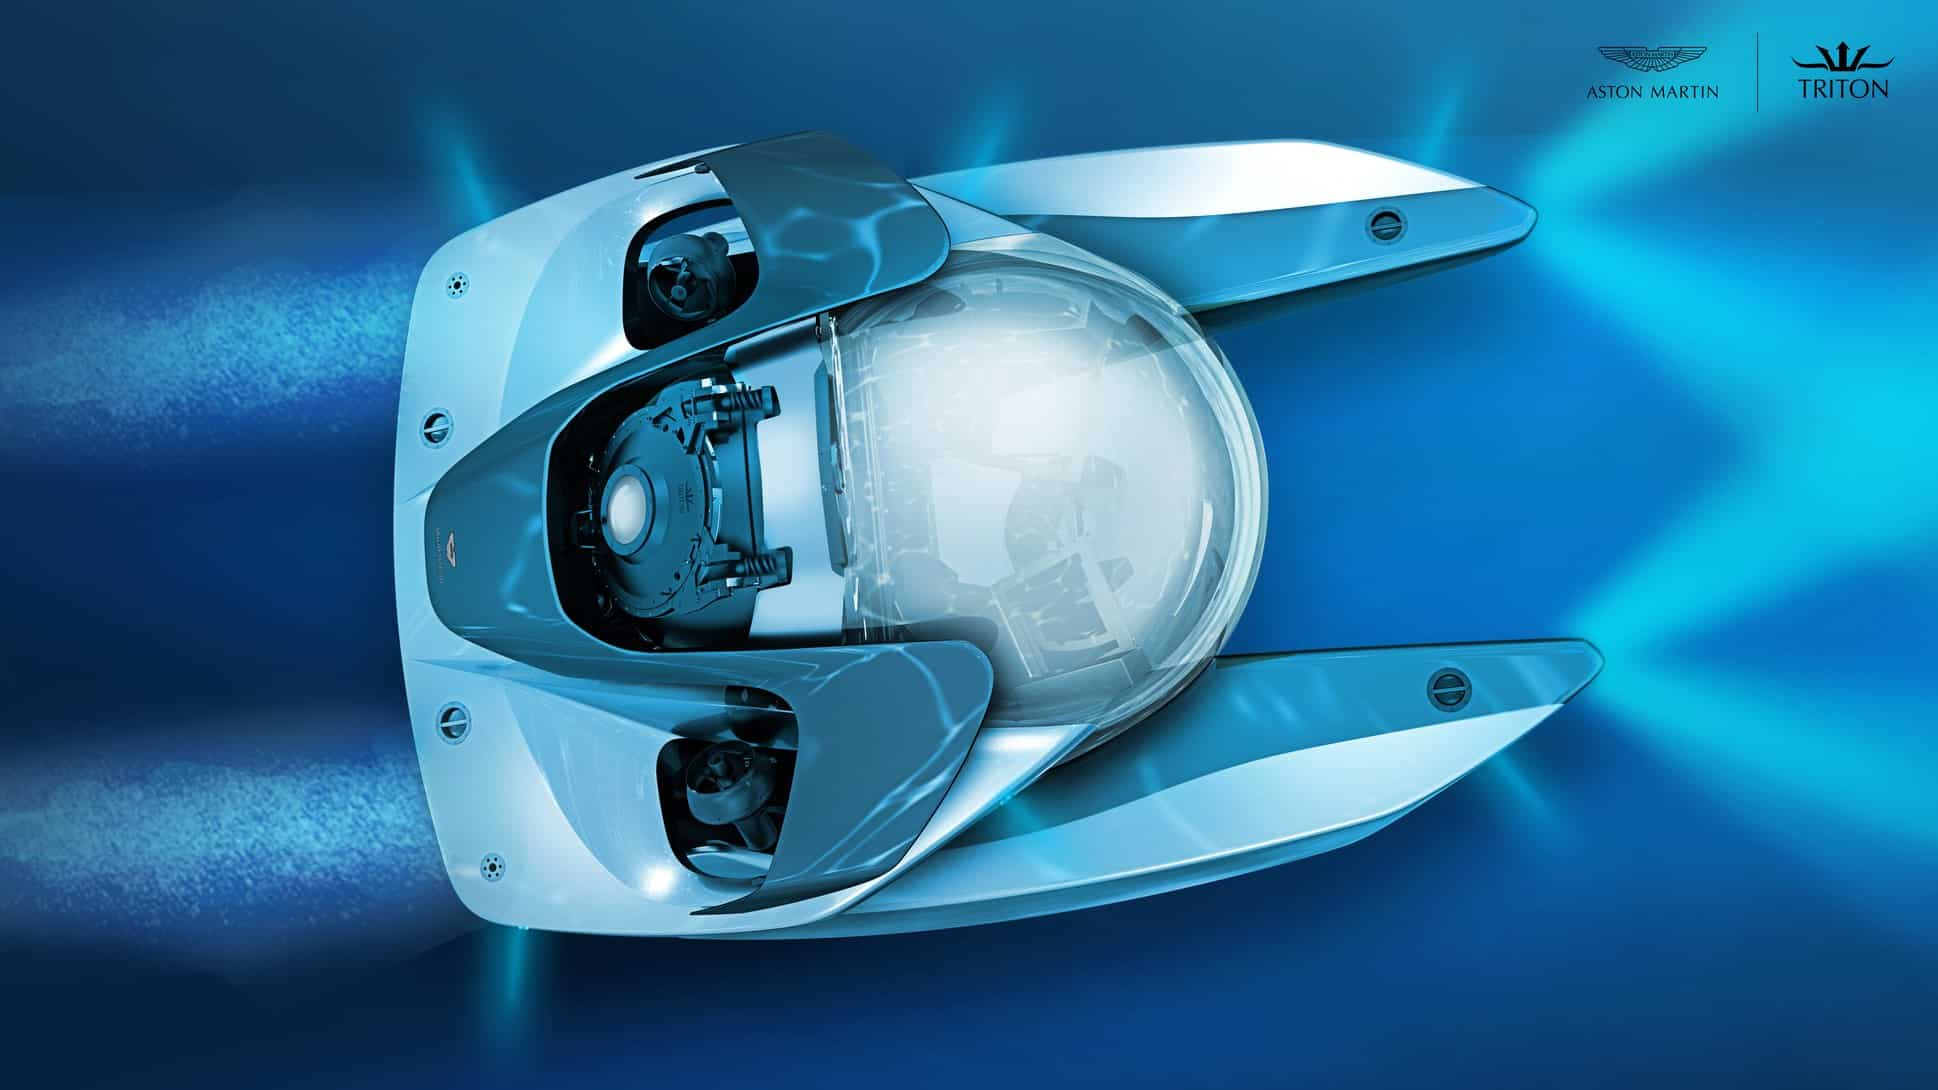 sous-marin Aston Martin